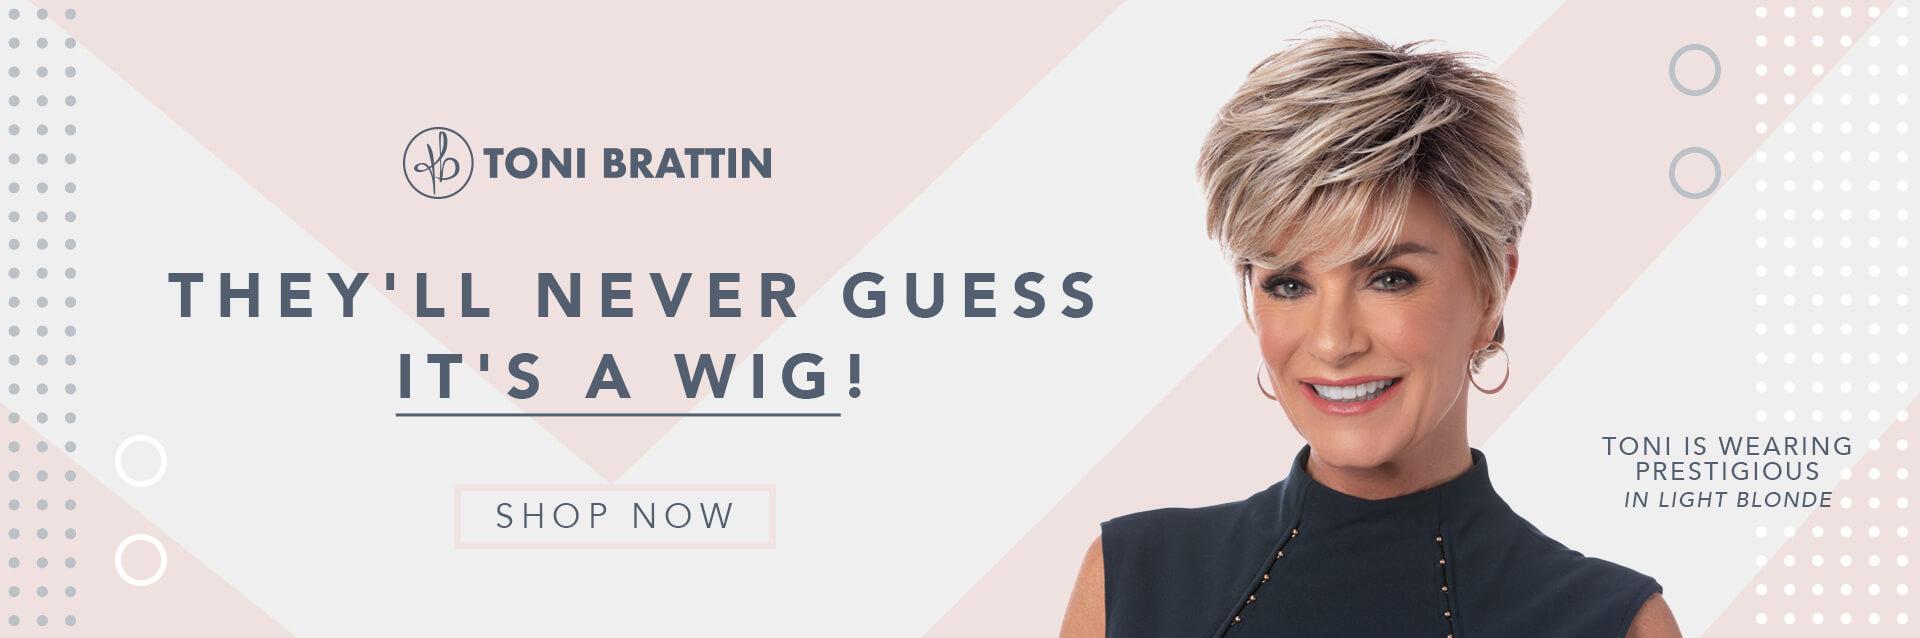 Toni Brattin Wigs